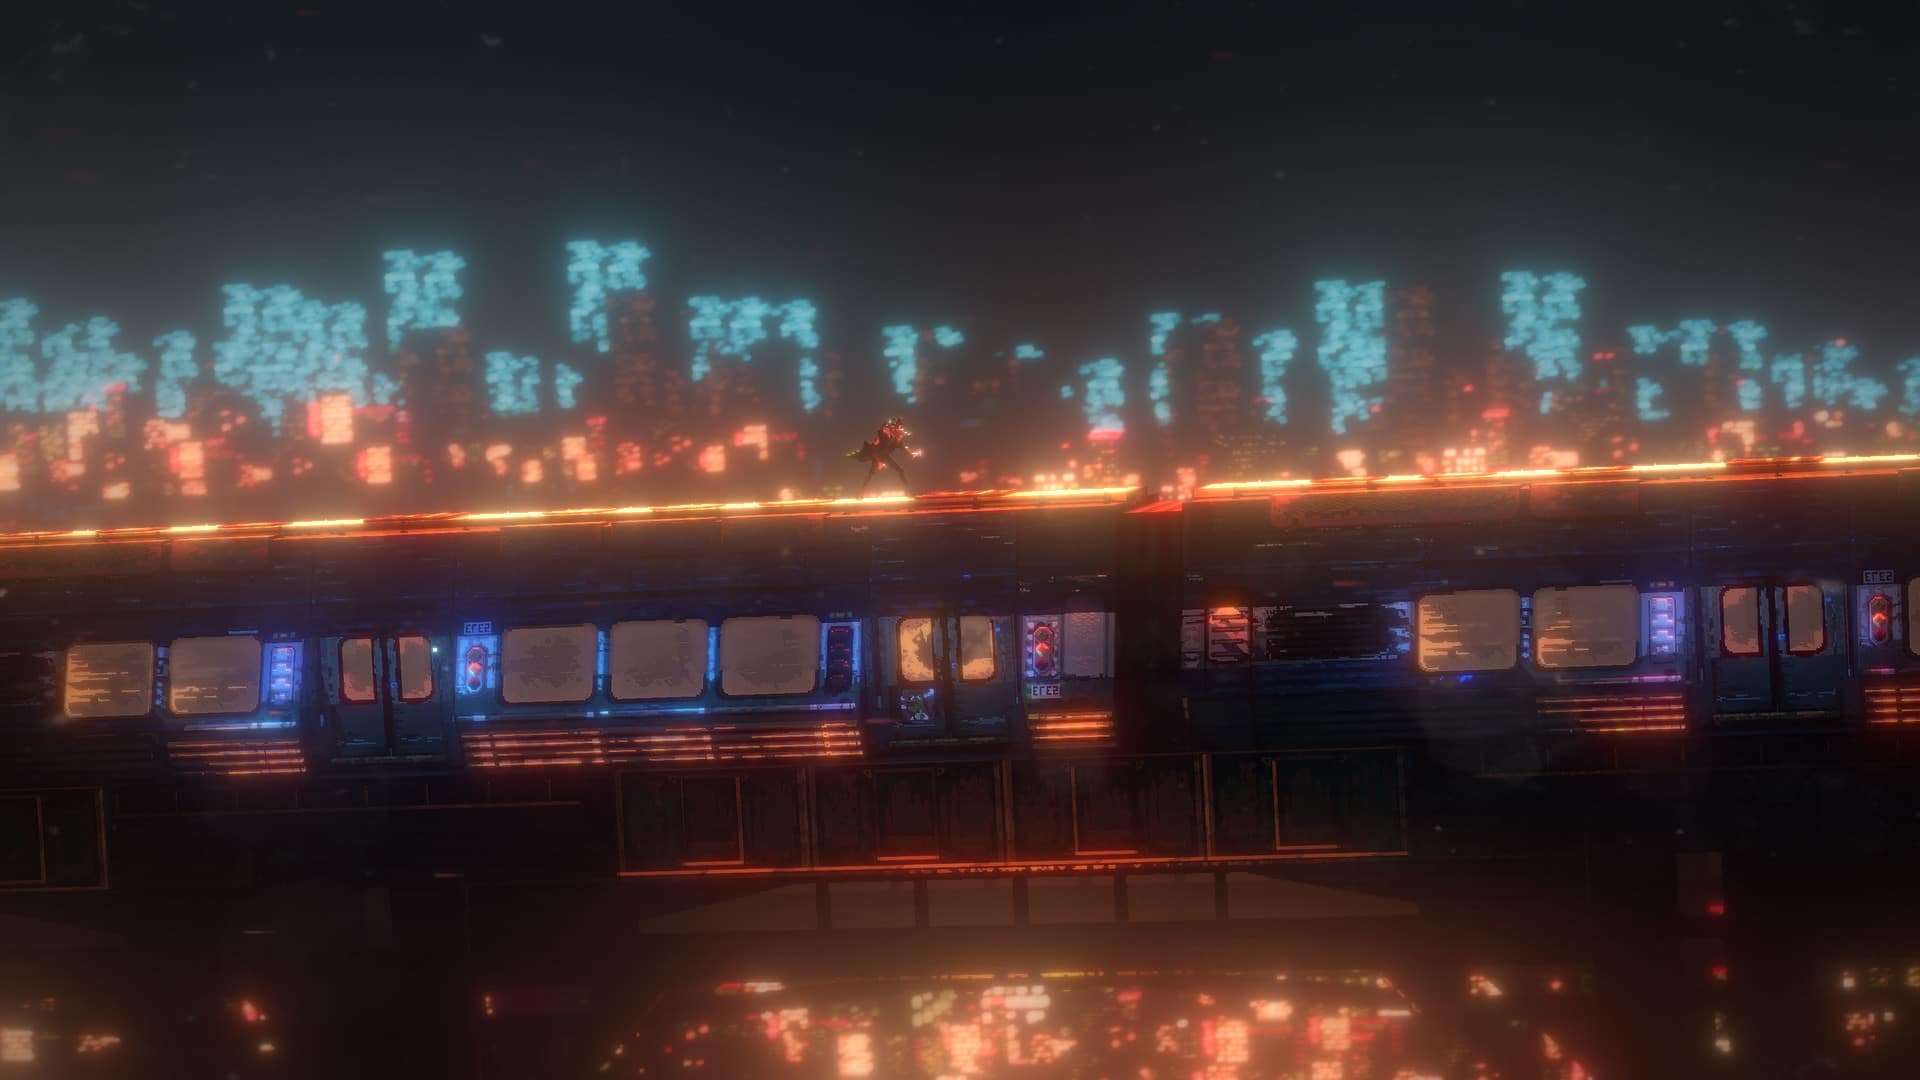 Replaced interview Igor Gritsay and Yura Zhdanovich of Sad Cat Studios retro-futuristic action platformer game Escapist